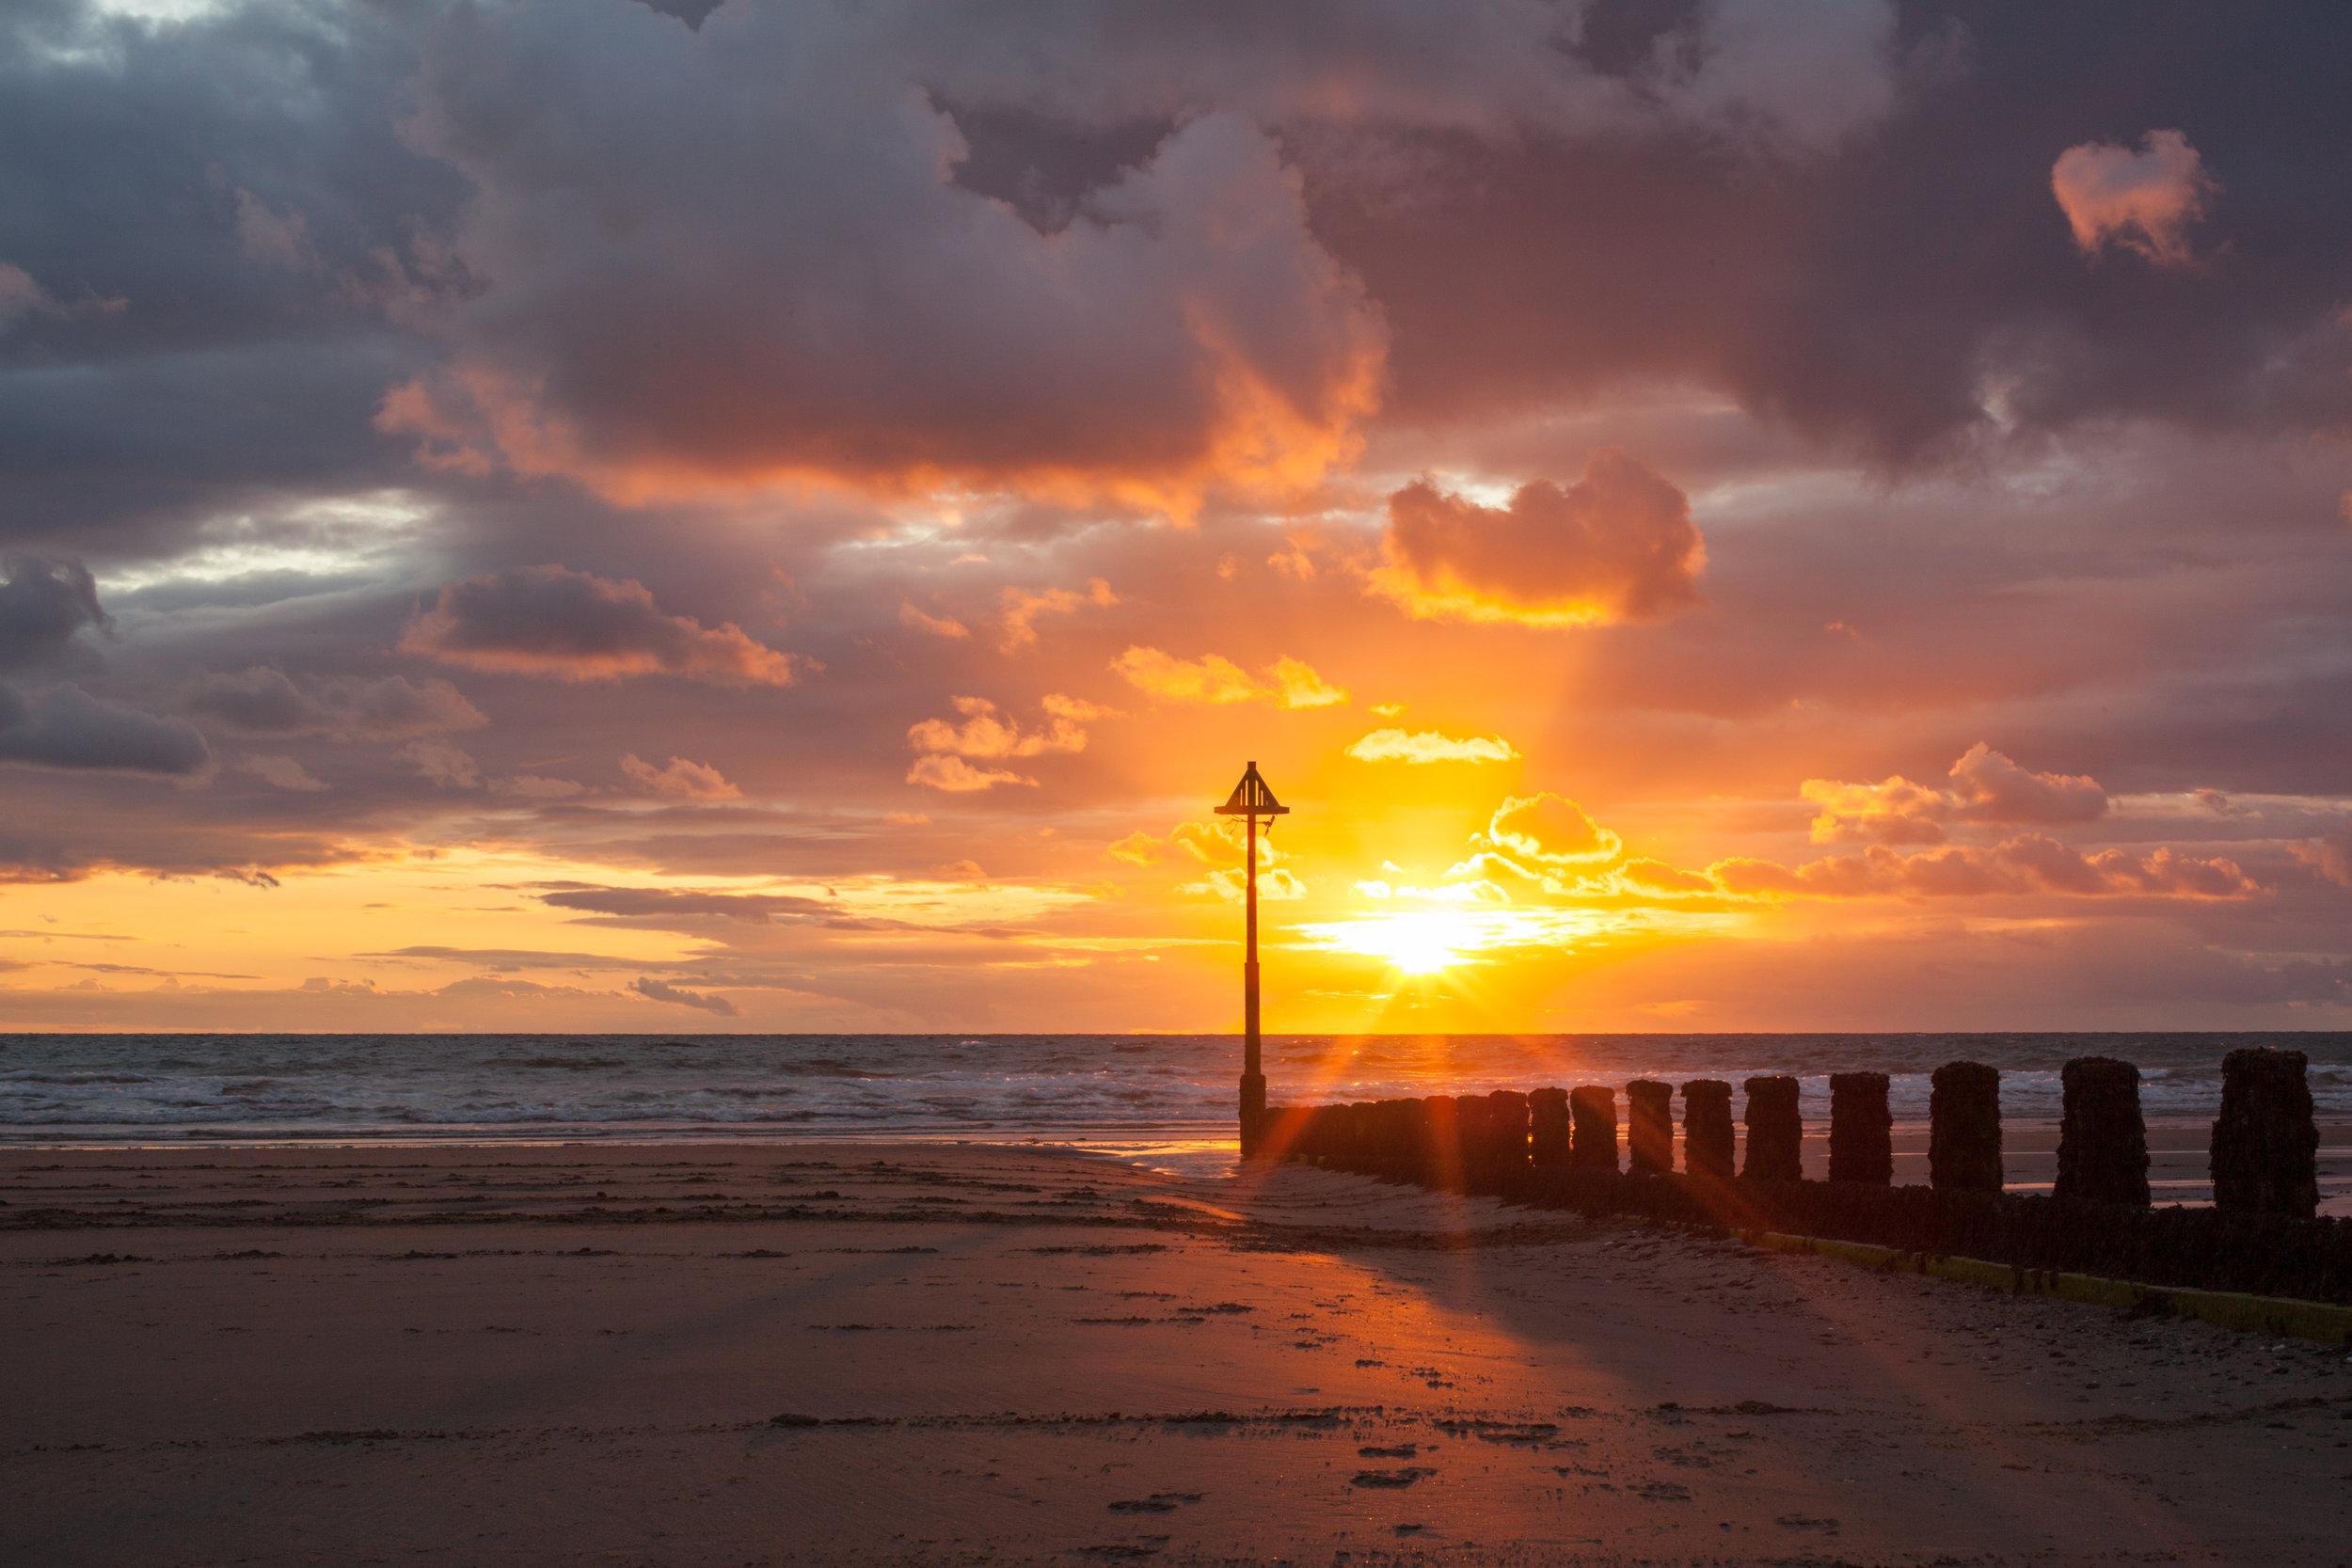 Borth Beach, Aberystwyth at Sunset.